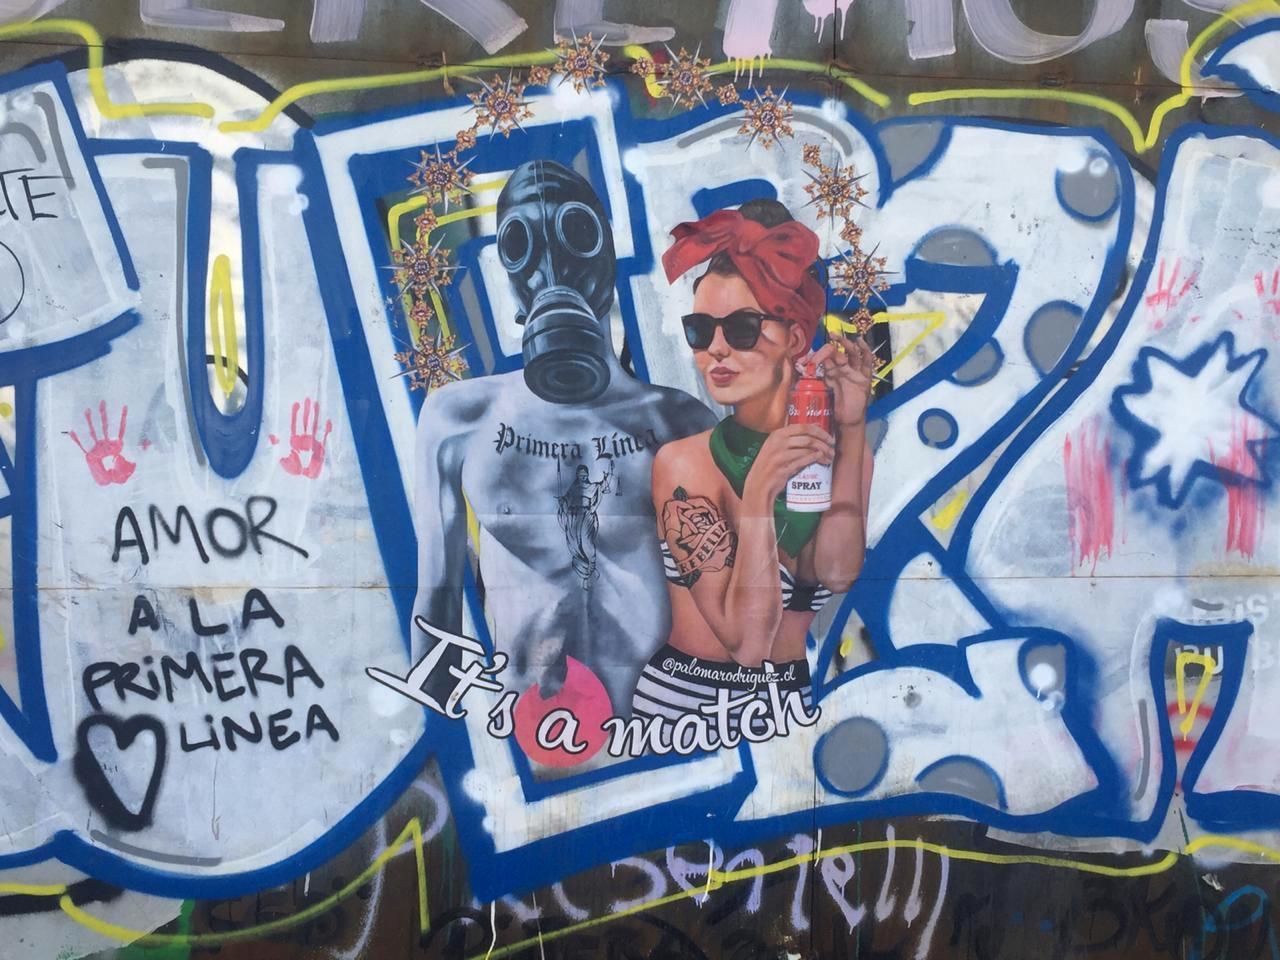 feminism latin america protest art santiago de chile capital arte urbano